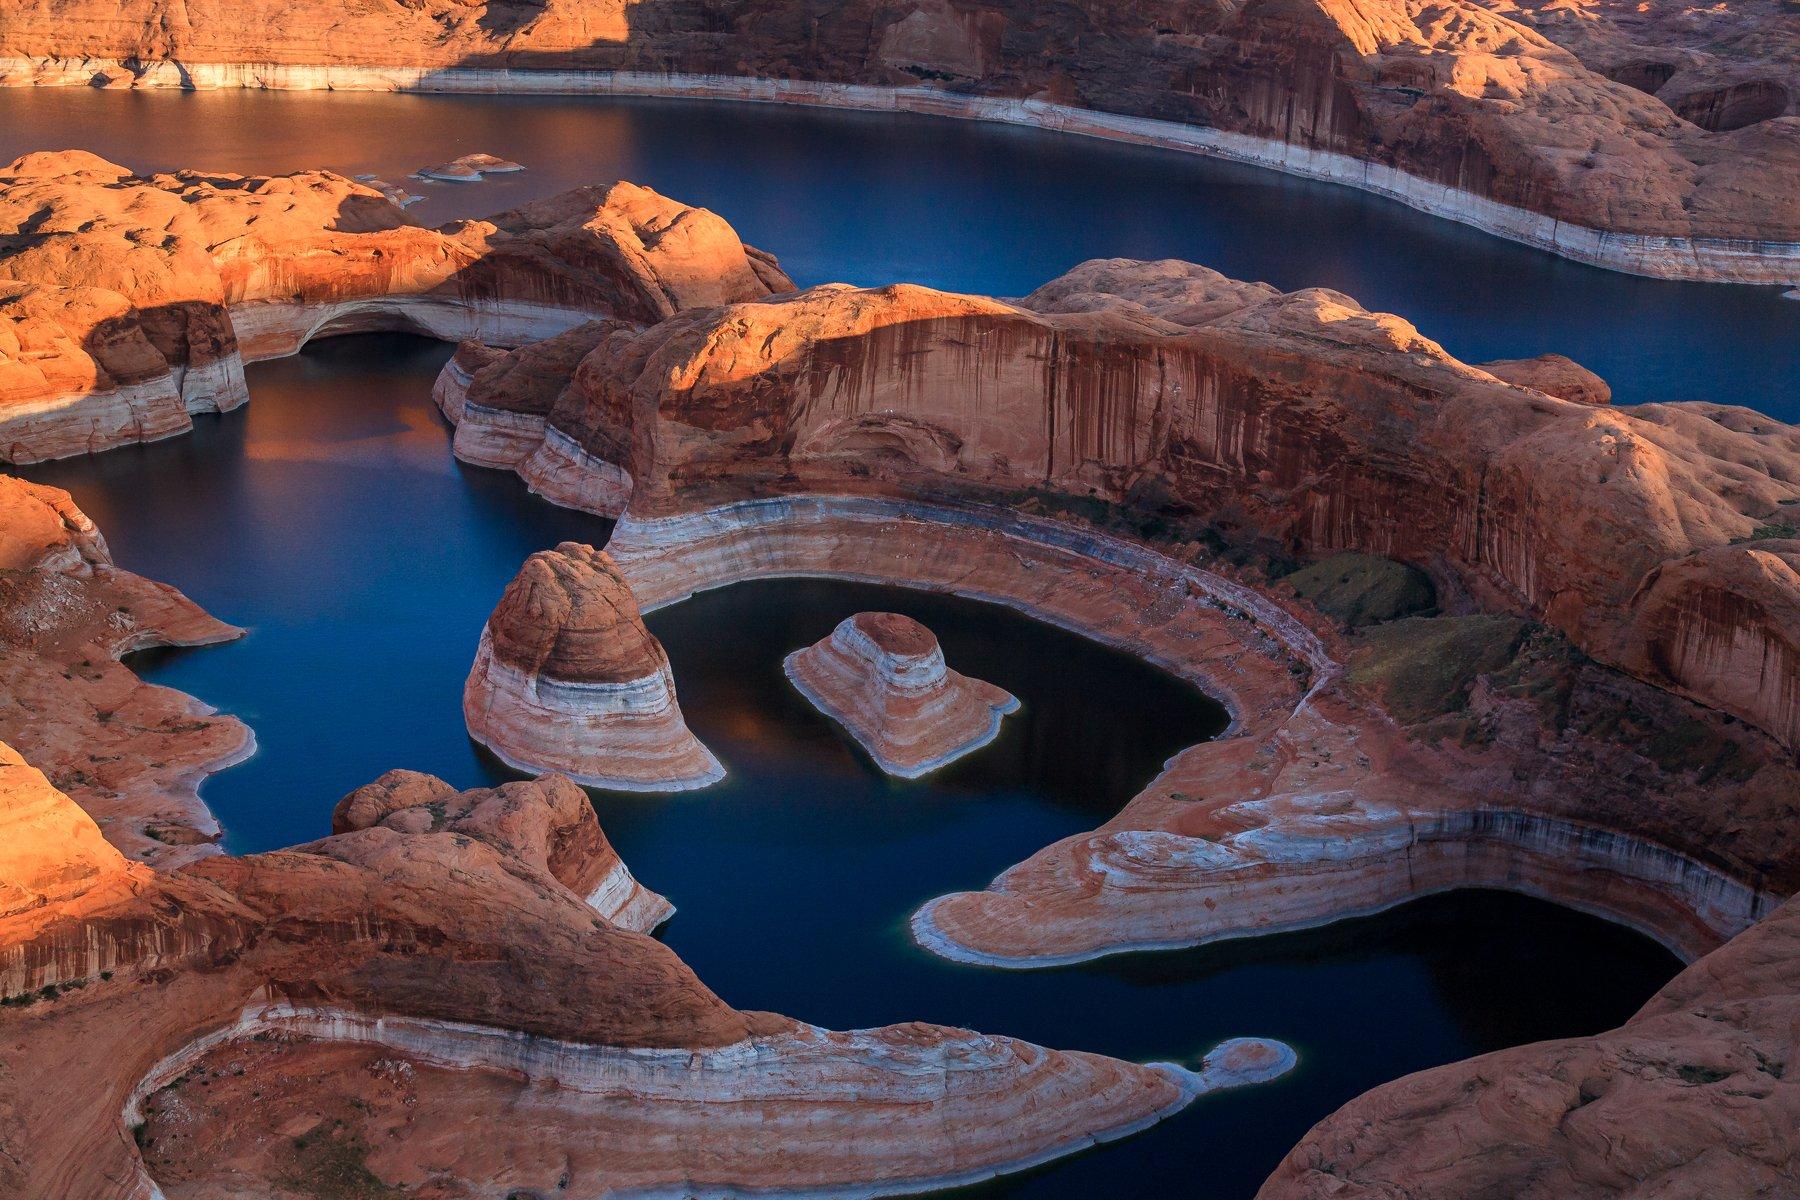 southwest, fotowalk, lake powell, usa, arizona, glen canyon, lake, adventure, helicopter, Глеб Тарро